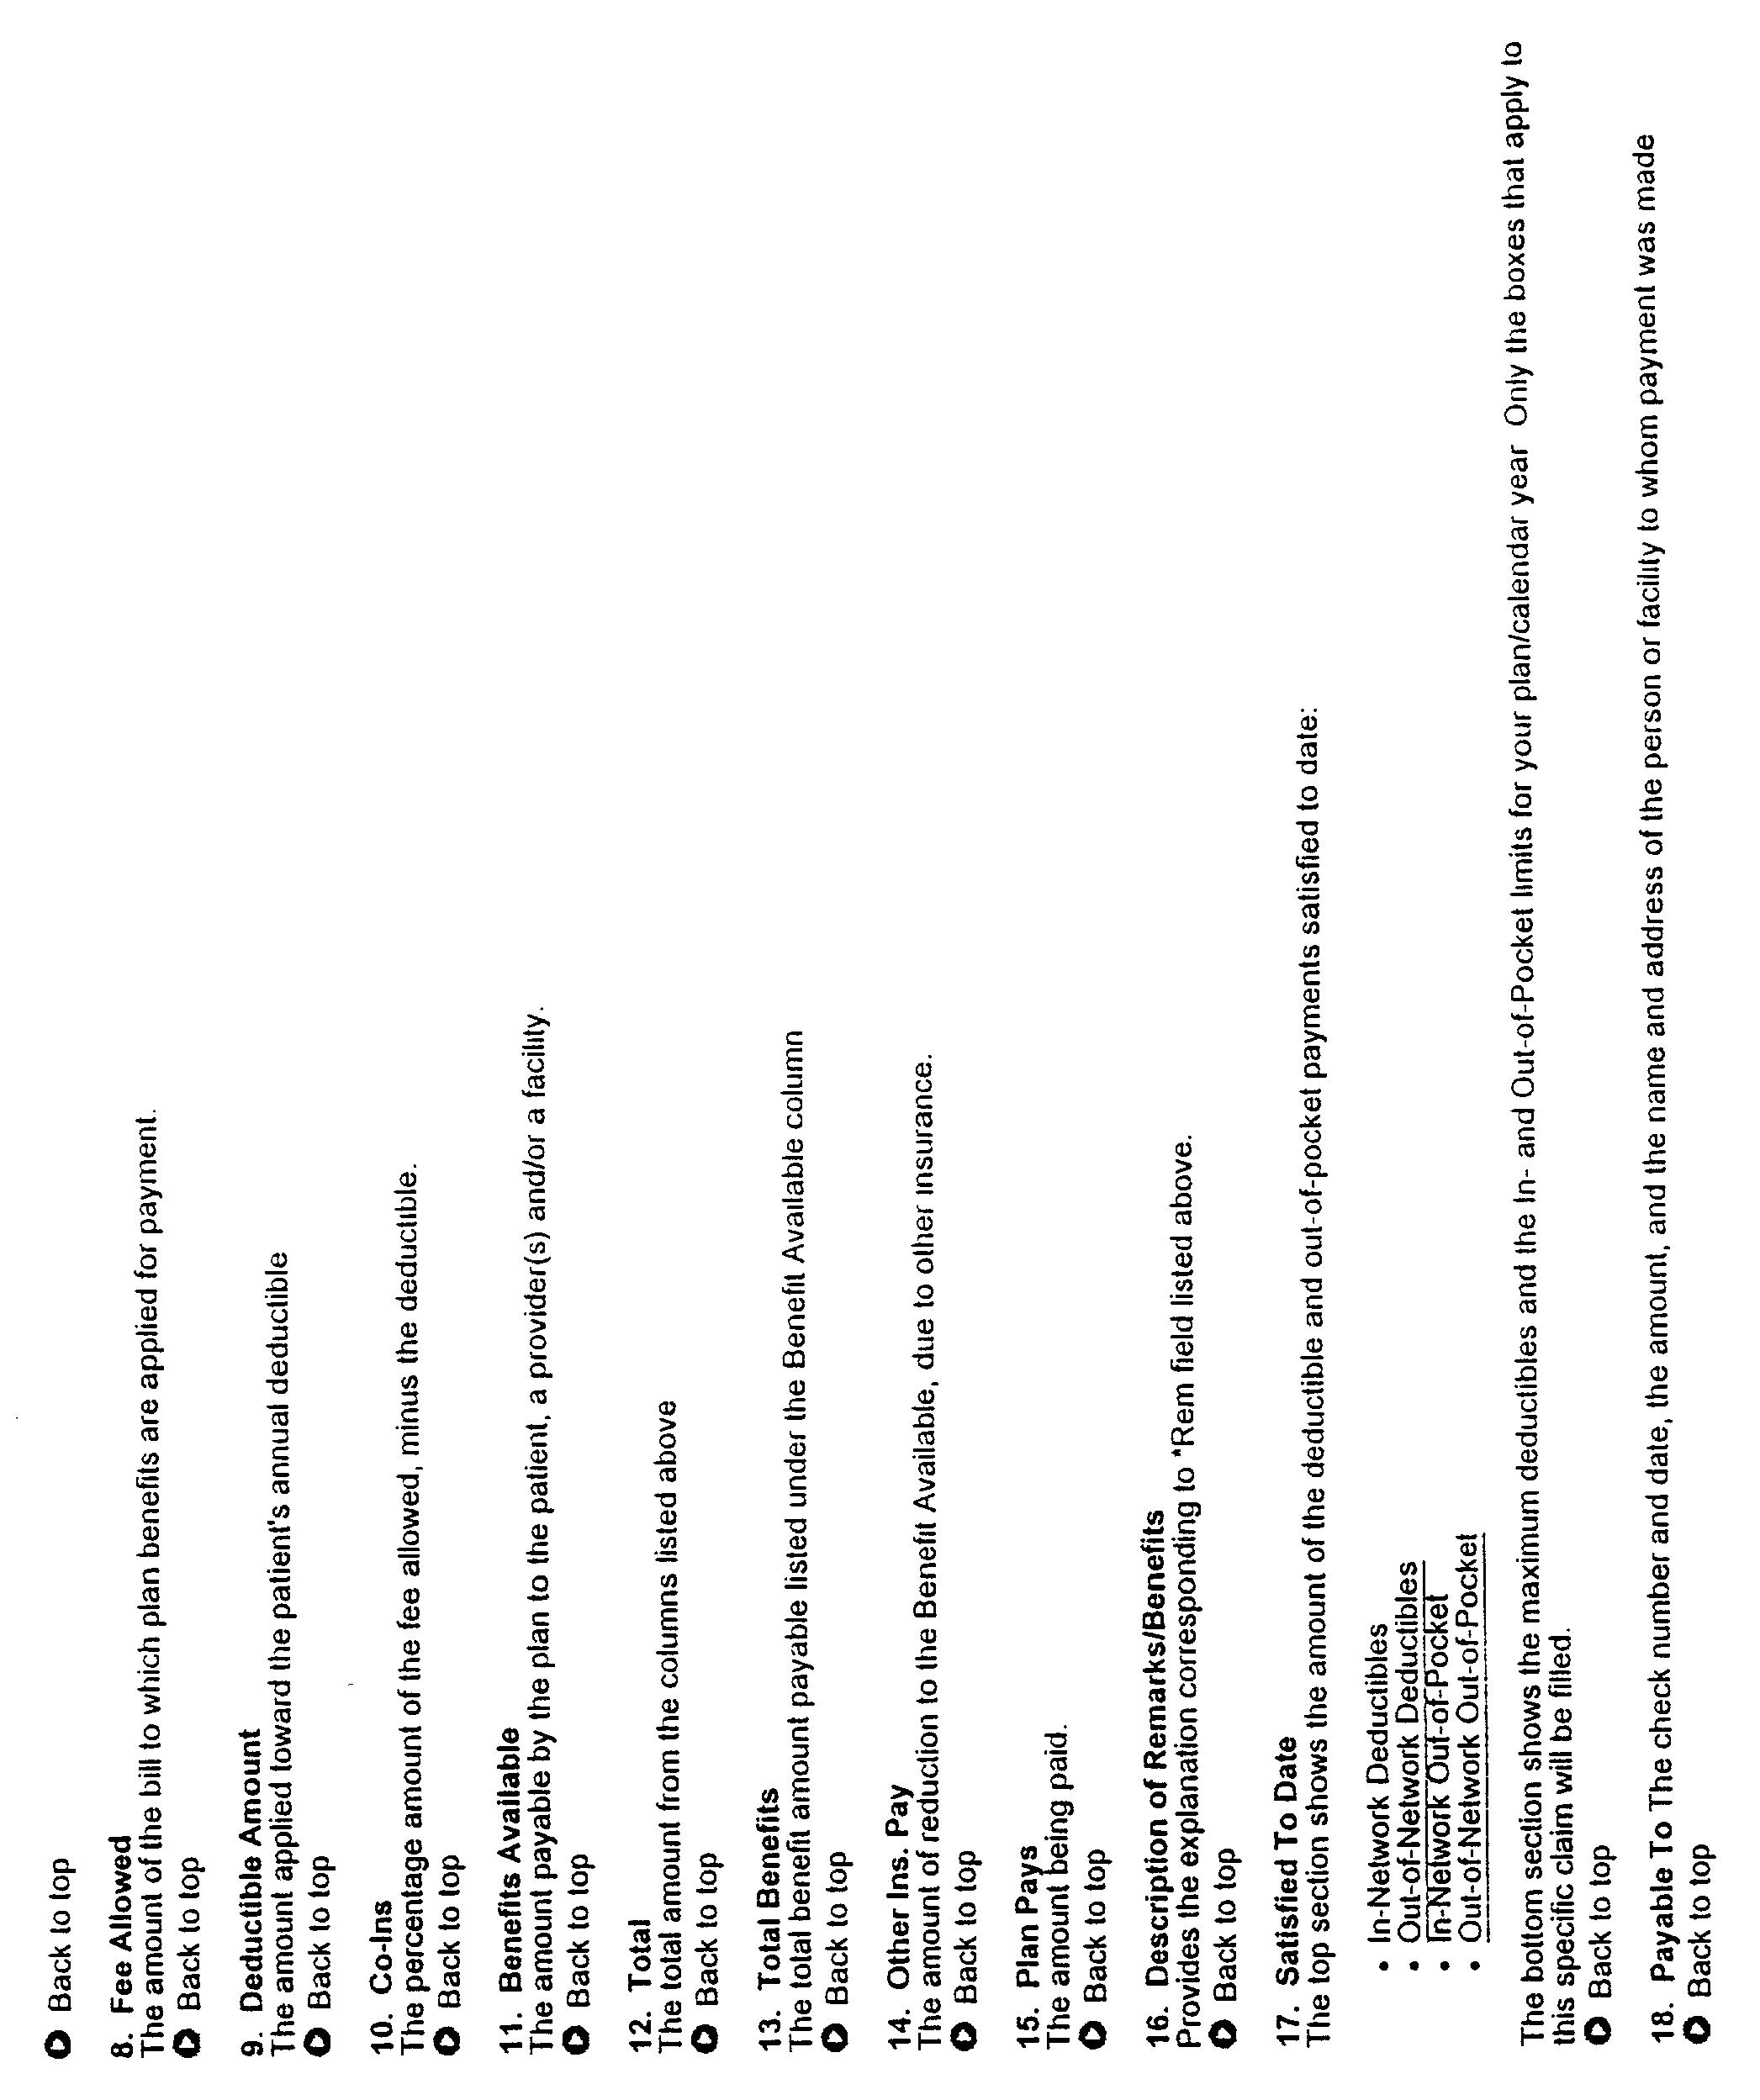 Figure US20020149616A1-20021017-P00181